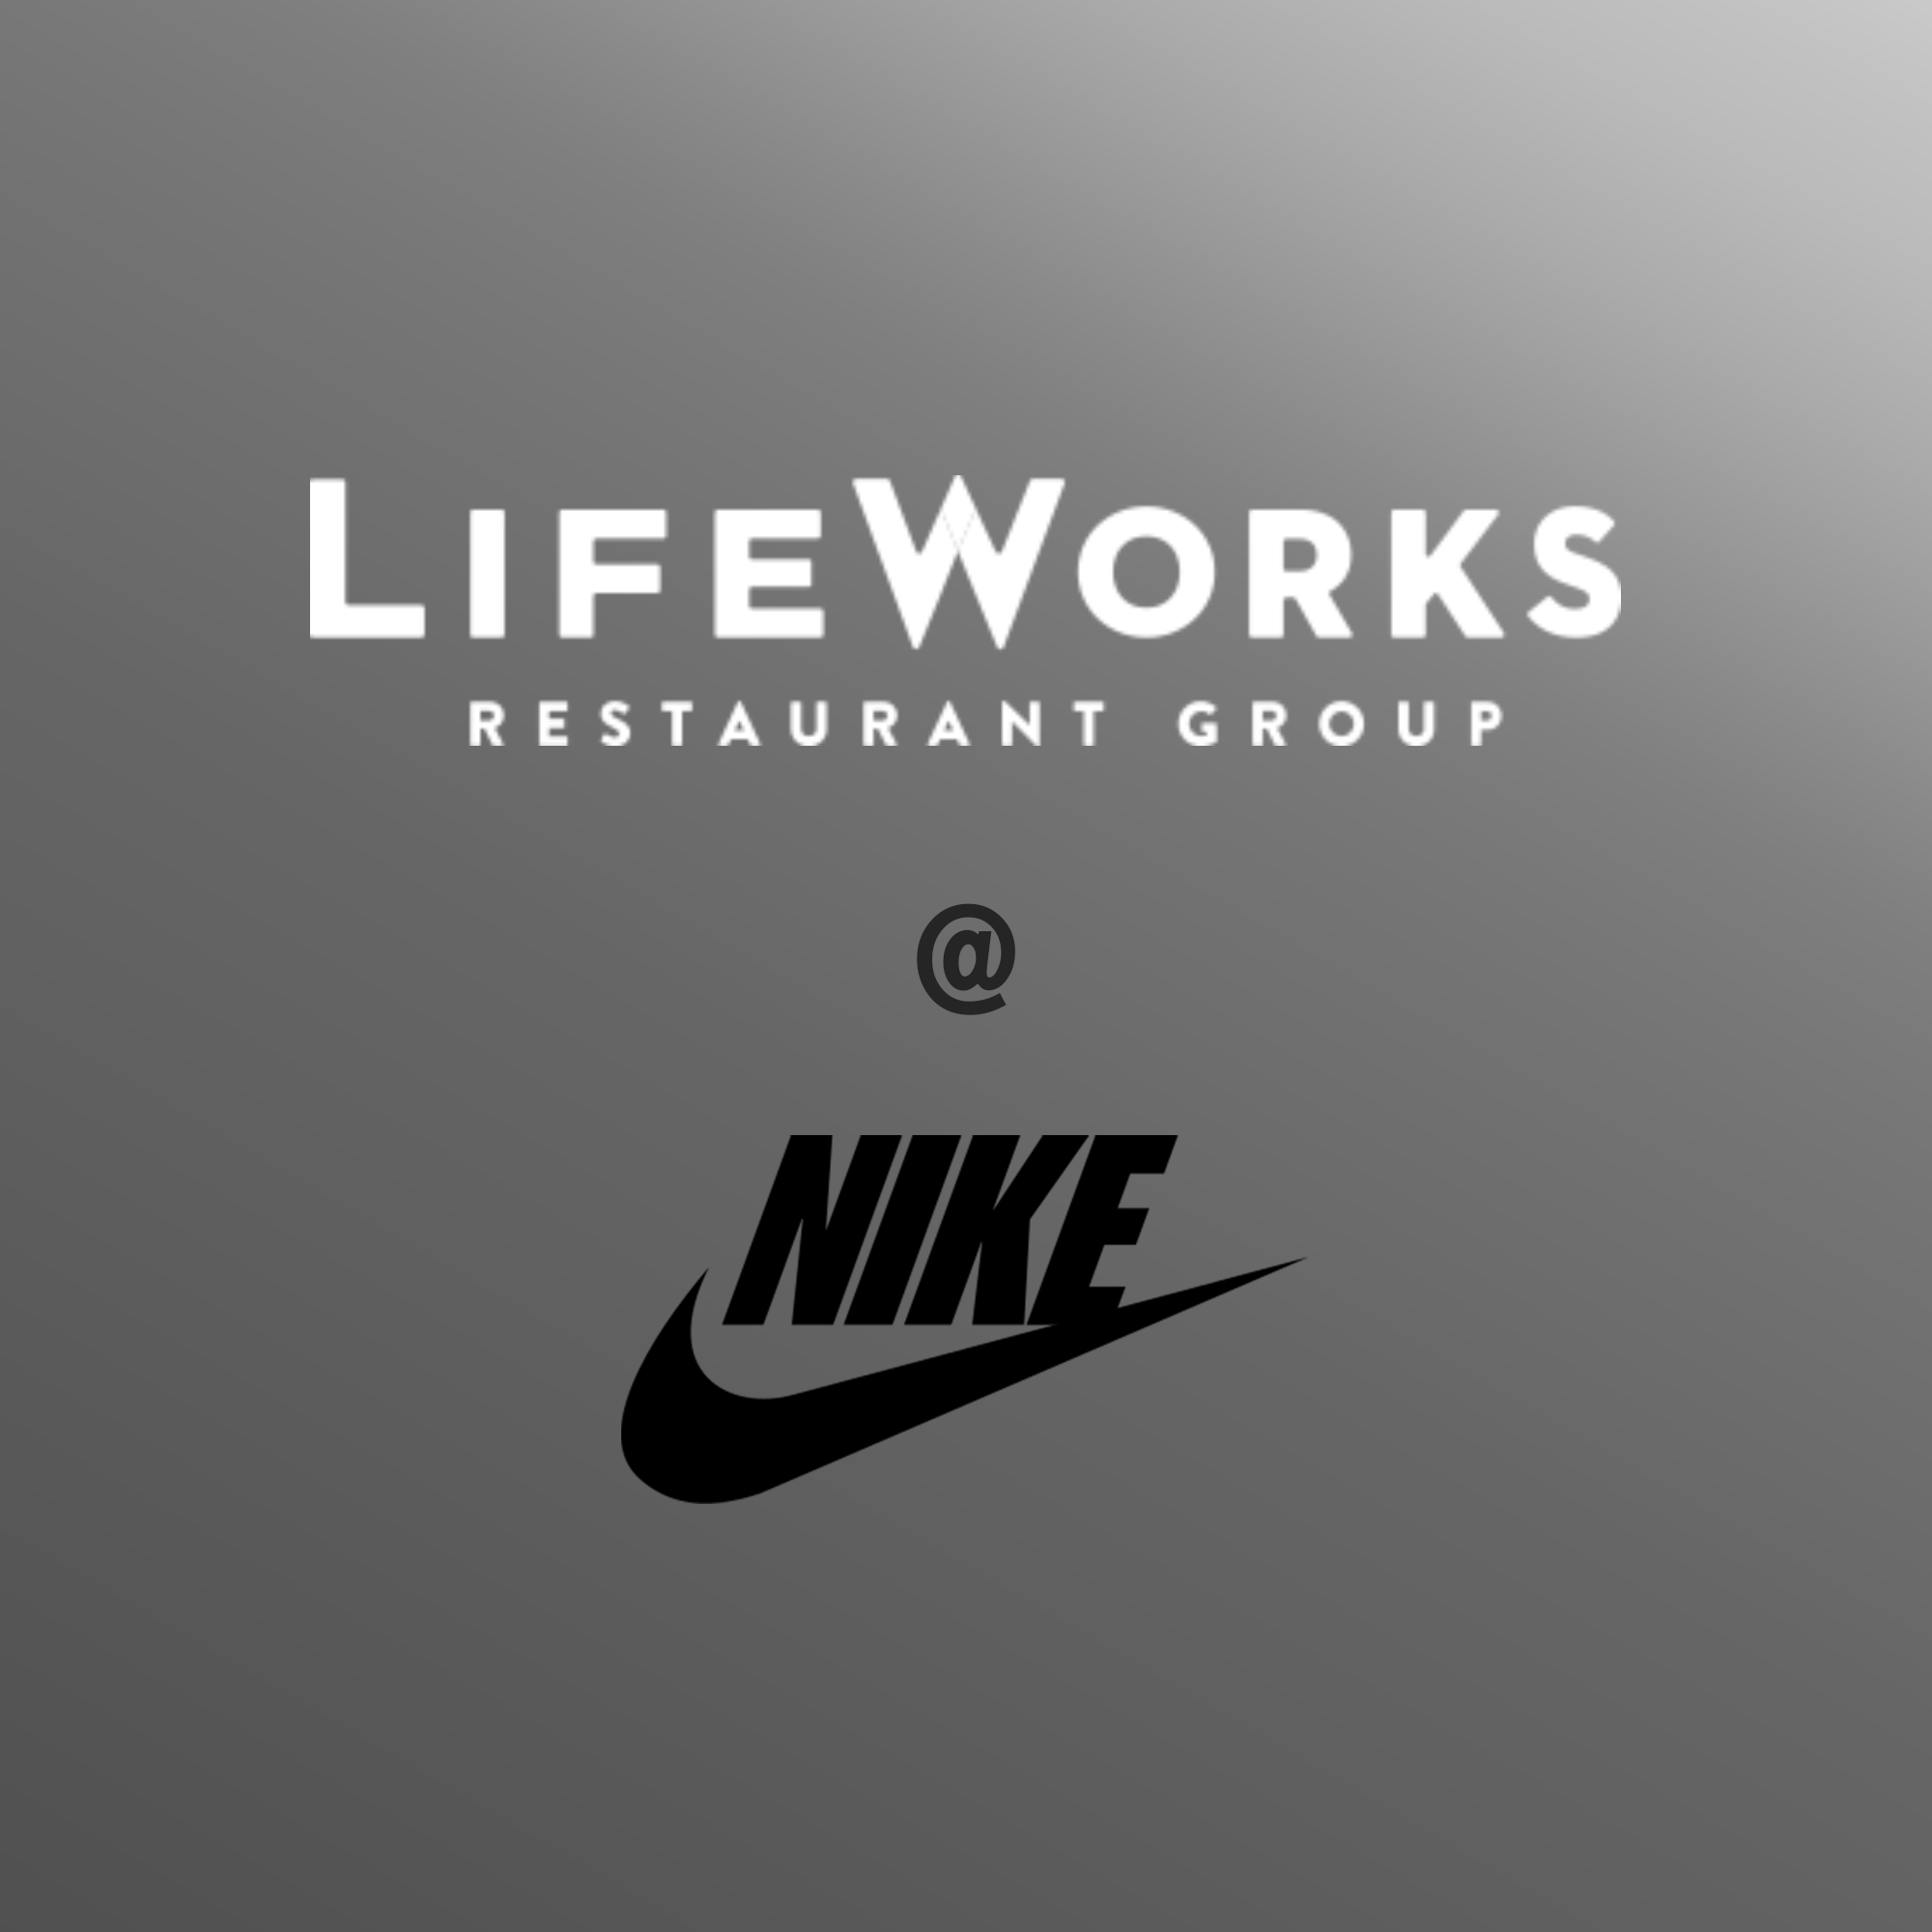 LifeWorks at NIKE